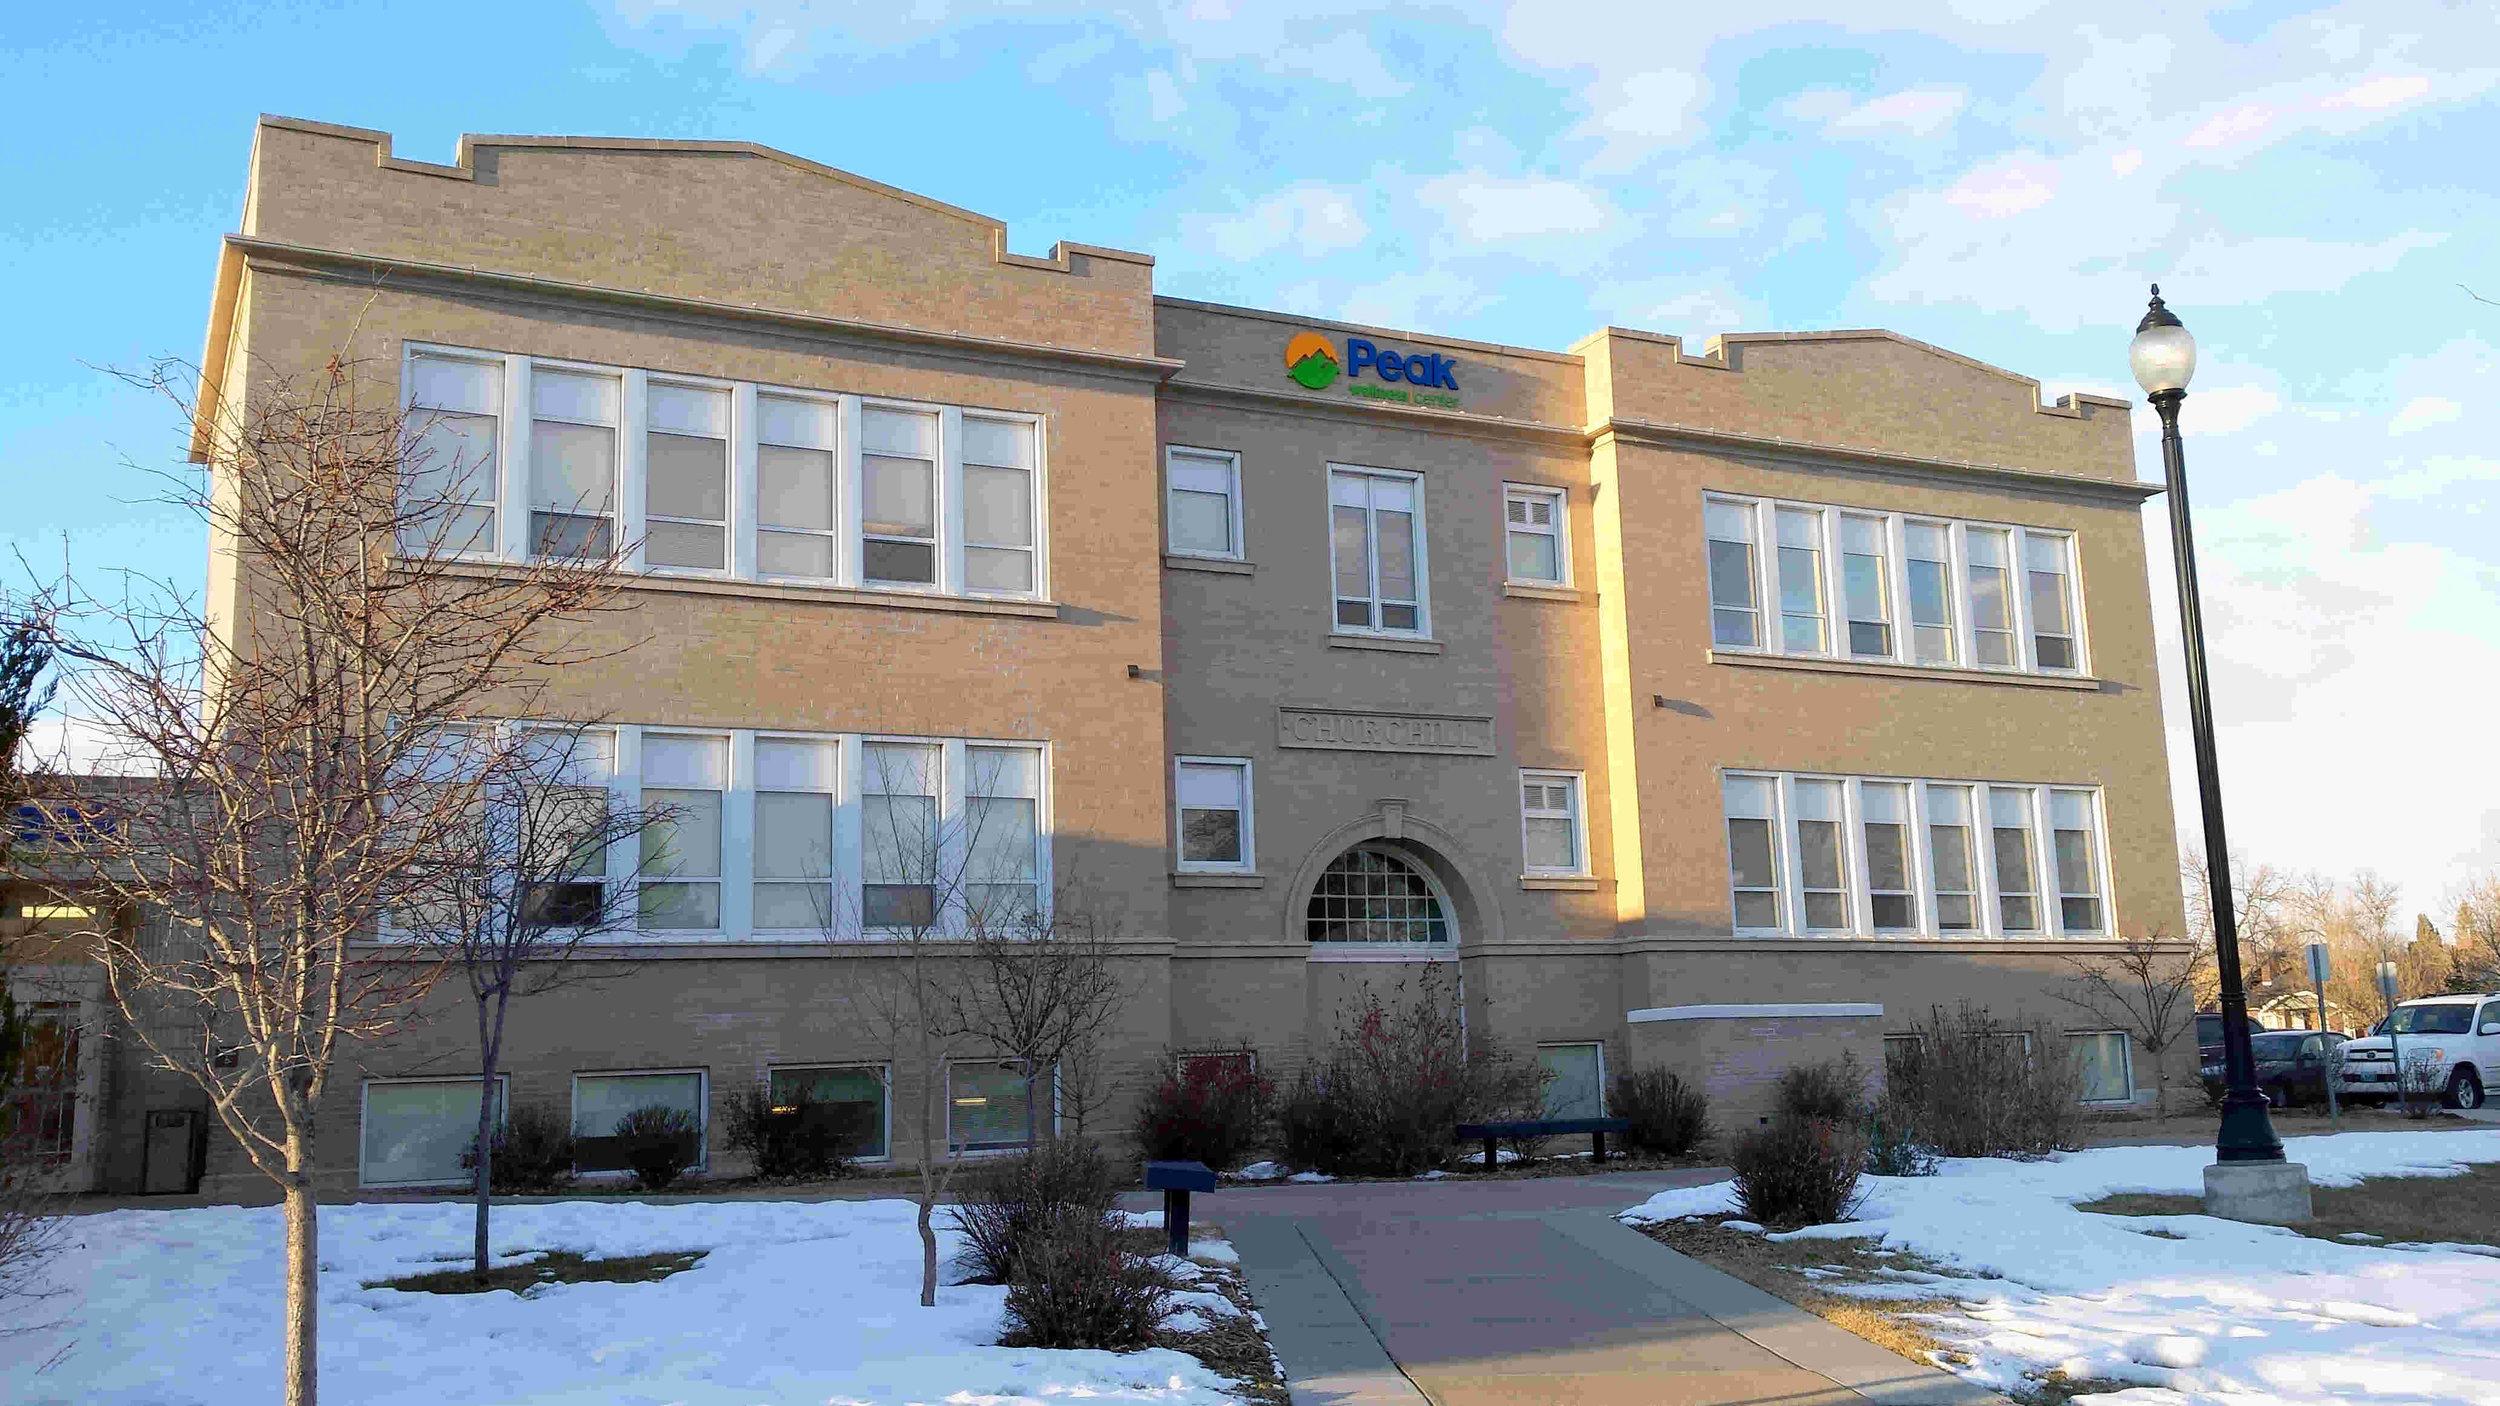 Churchill Elementary School